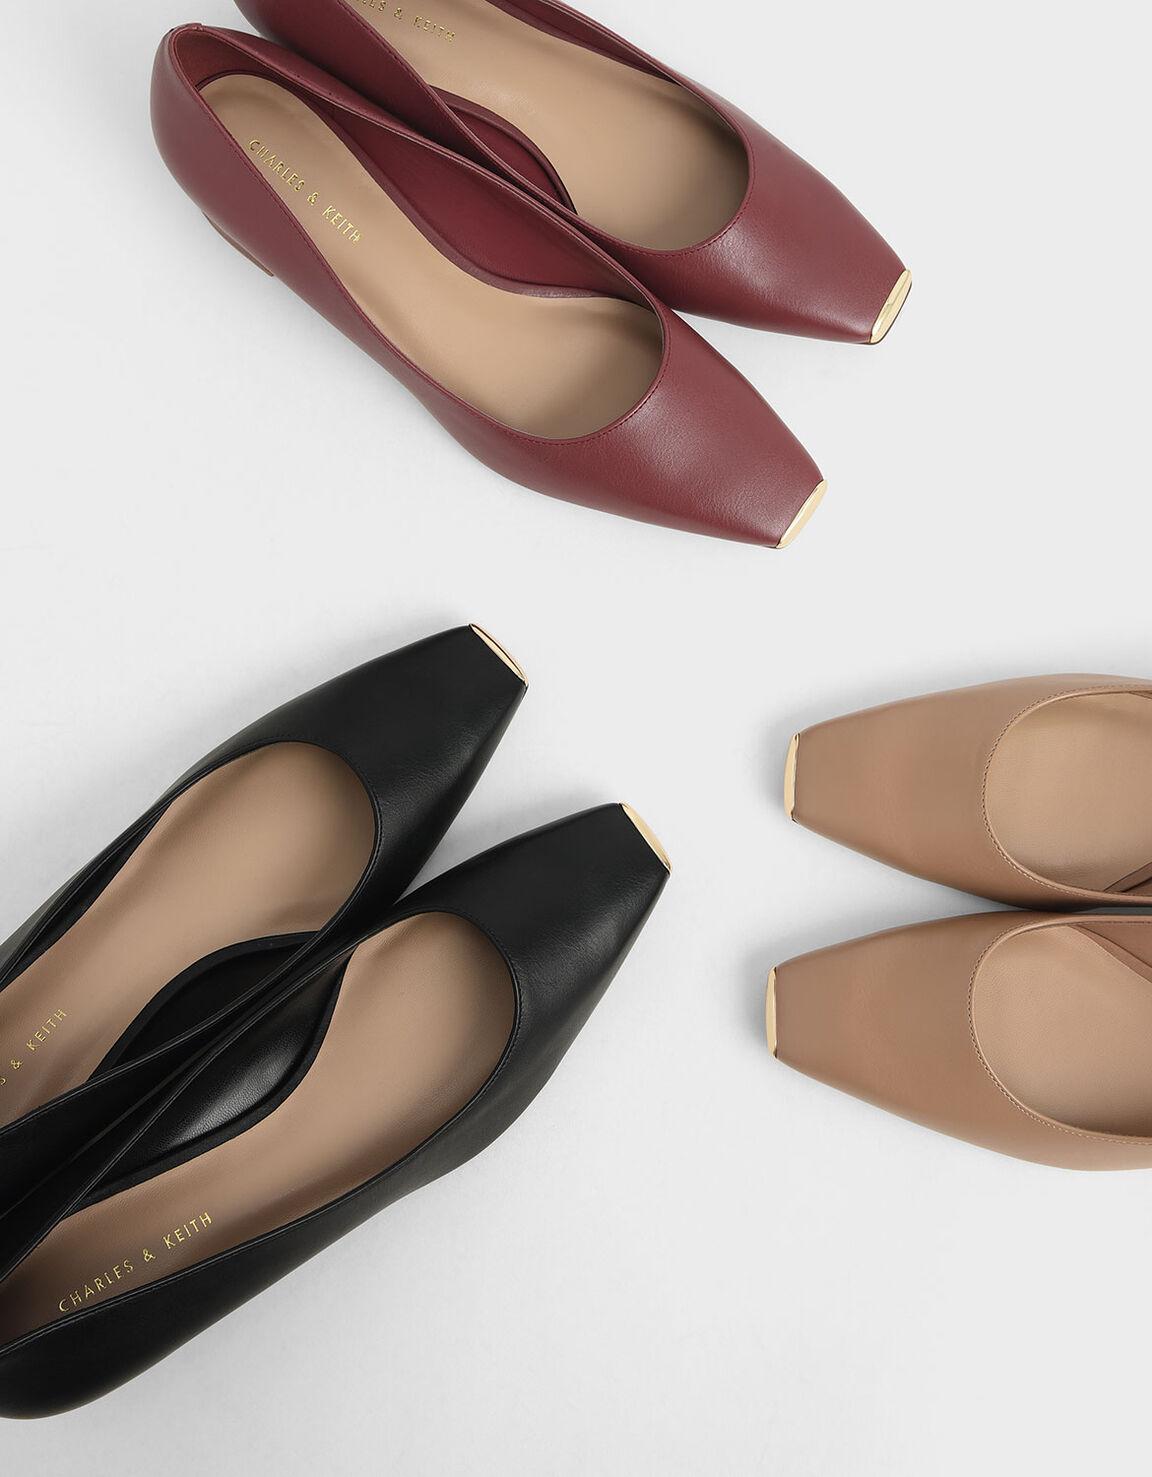 CHARLES & KEITH 鞋款低至34折優惠!:第13張圖片